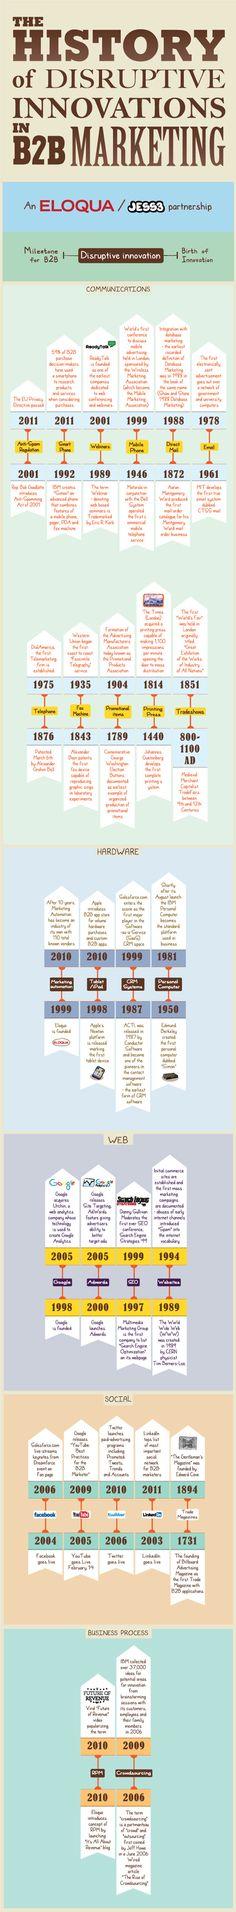 The History of disruptive Innovations in B2B Marketing  - http://jess3.com/eloqua-history-disruptive-b2b-innovations/